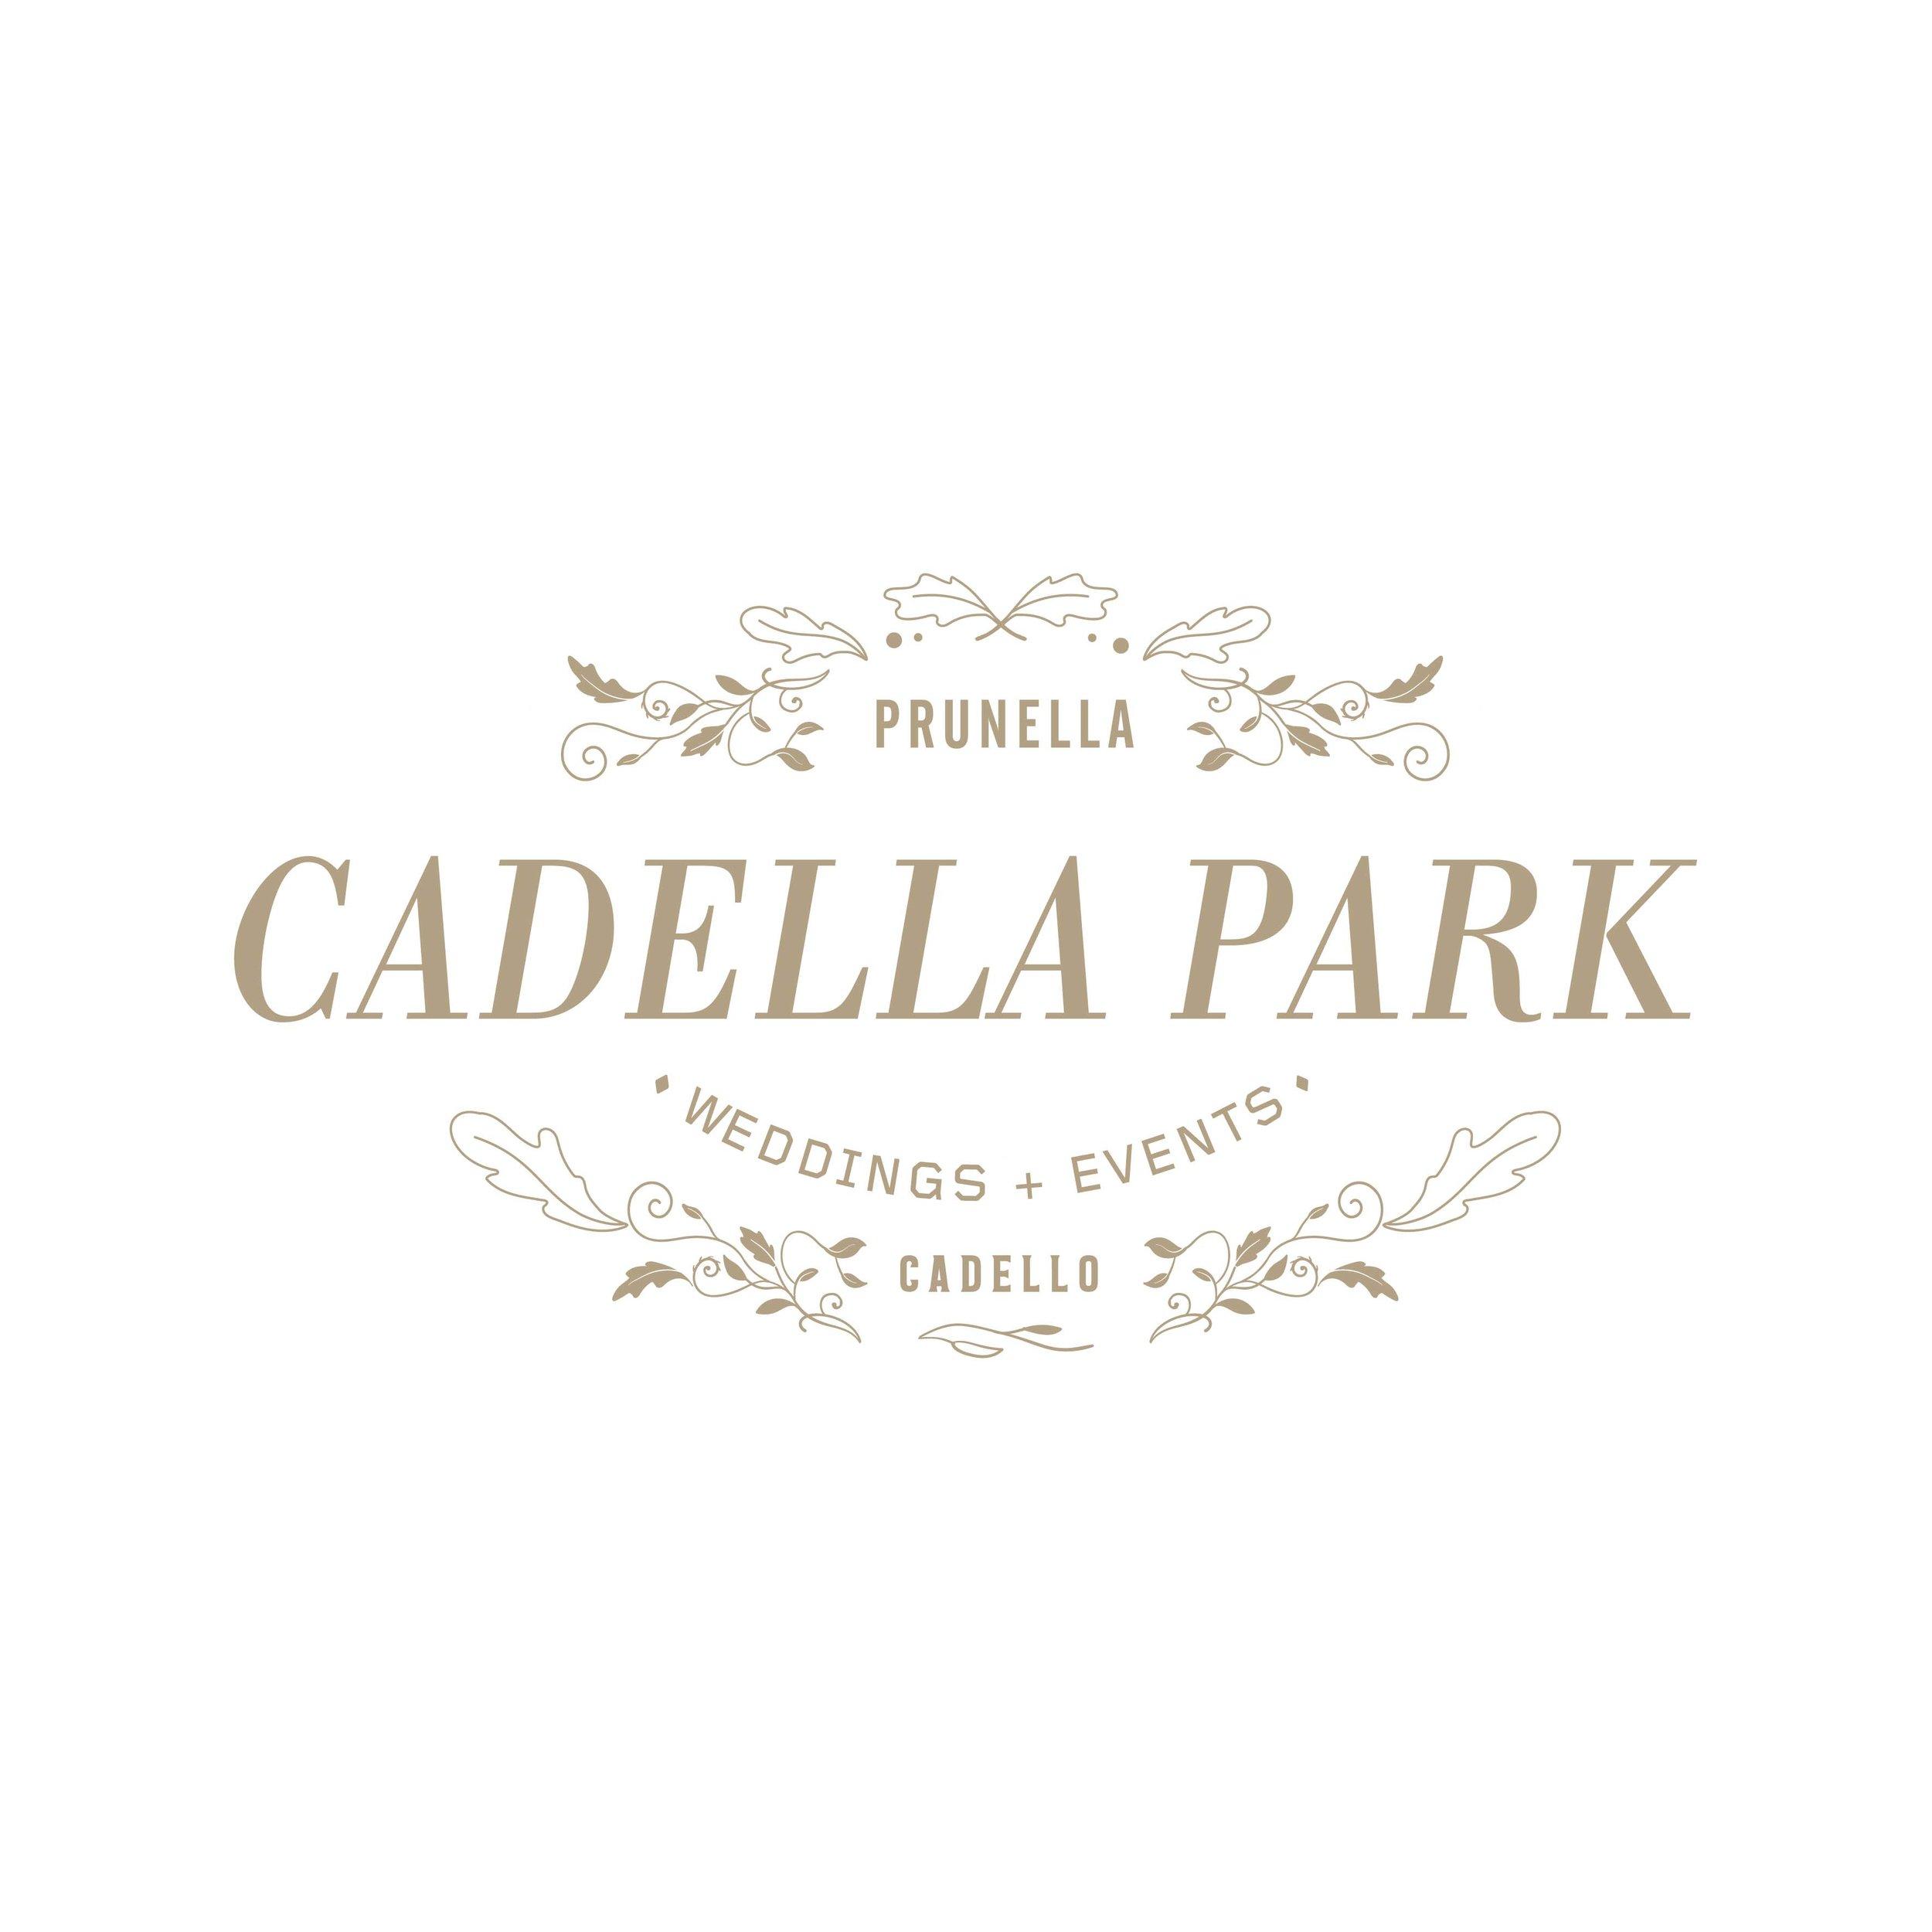 CadellaPark_logo_Gld_SQ.jpg